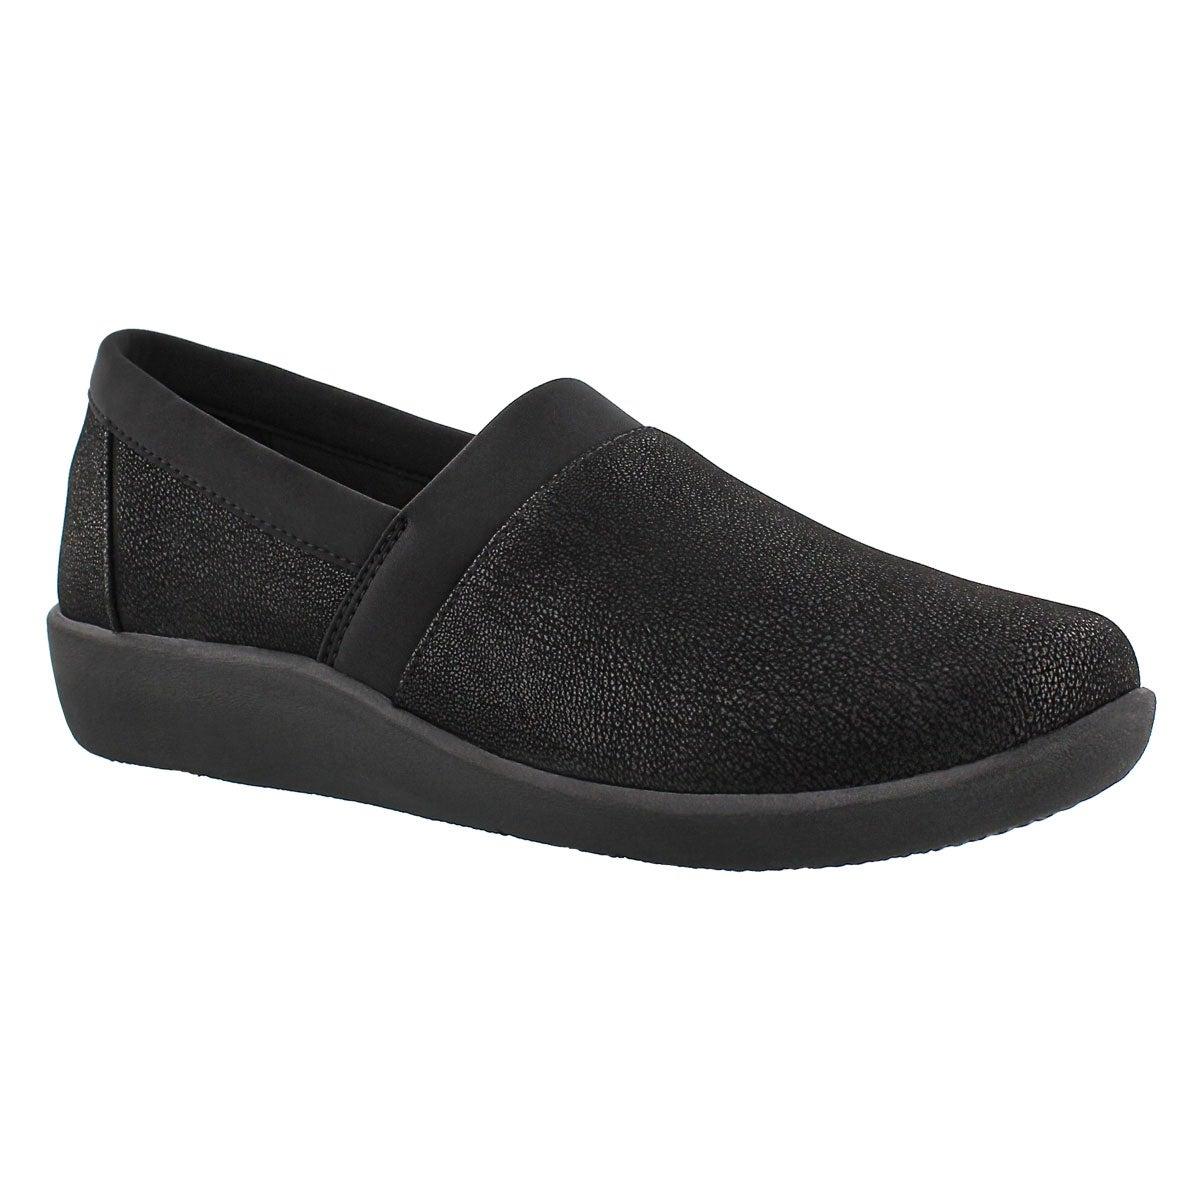 Women's SILLIAN BLAIR black slip on loafers